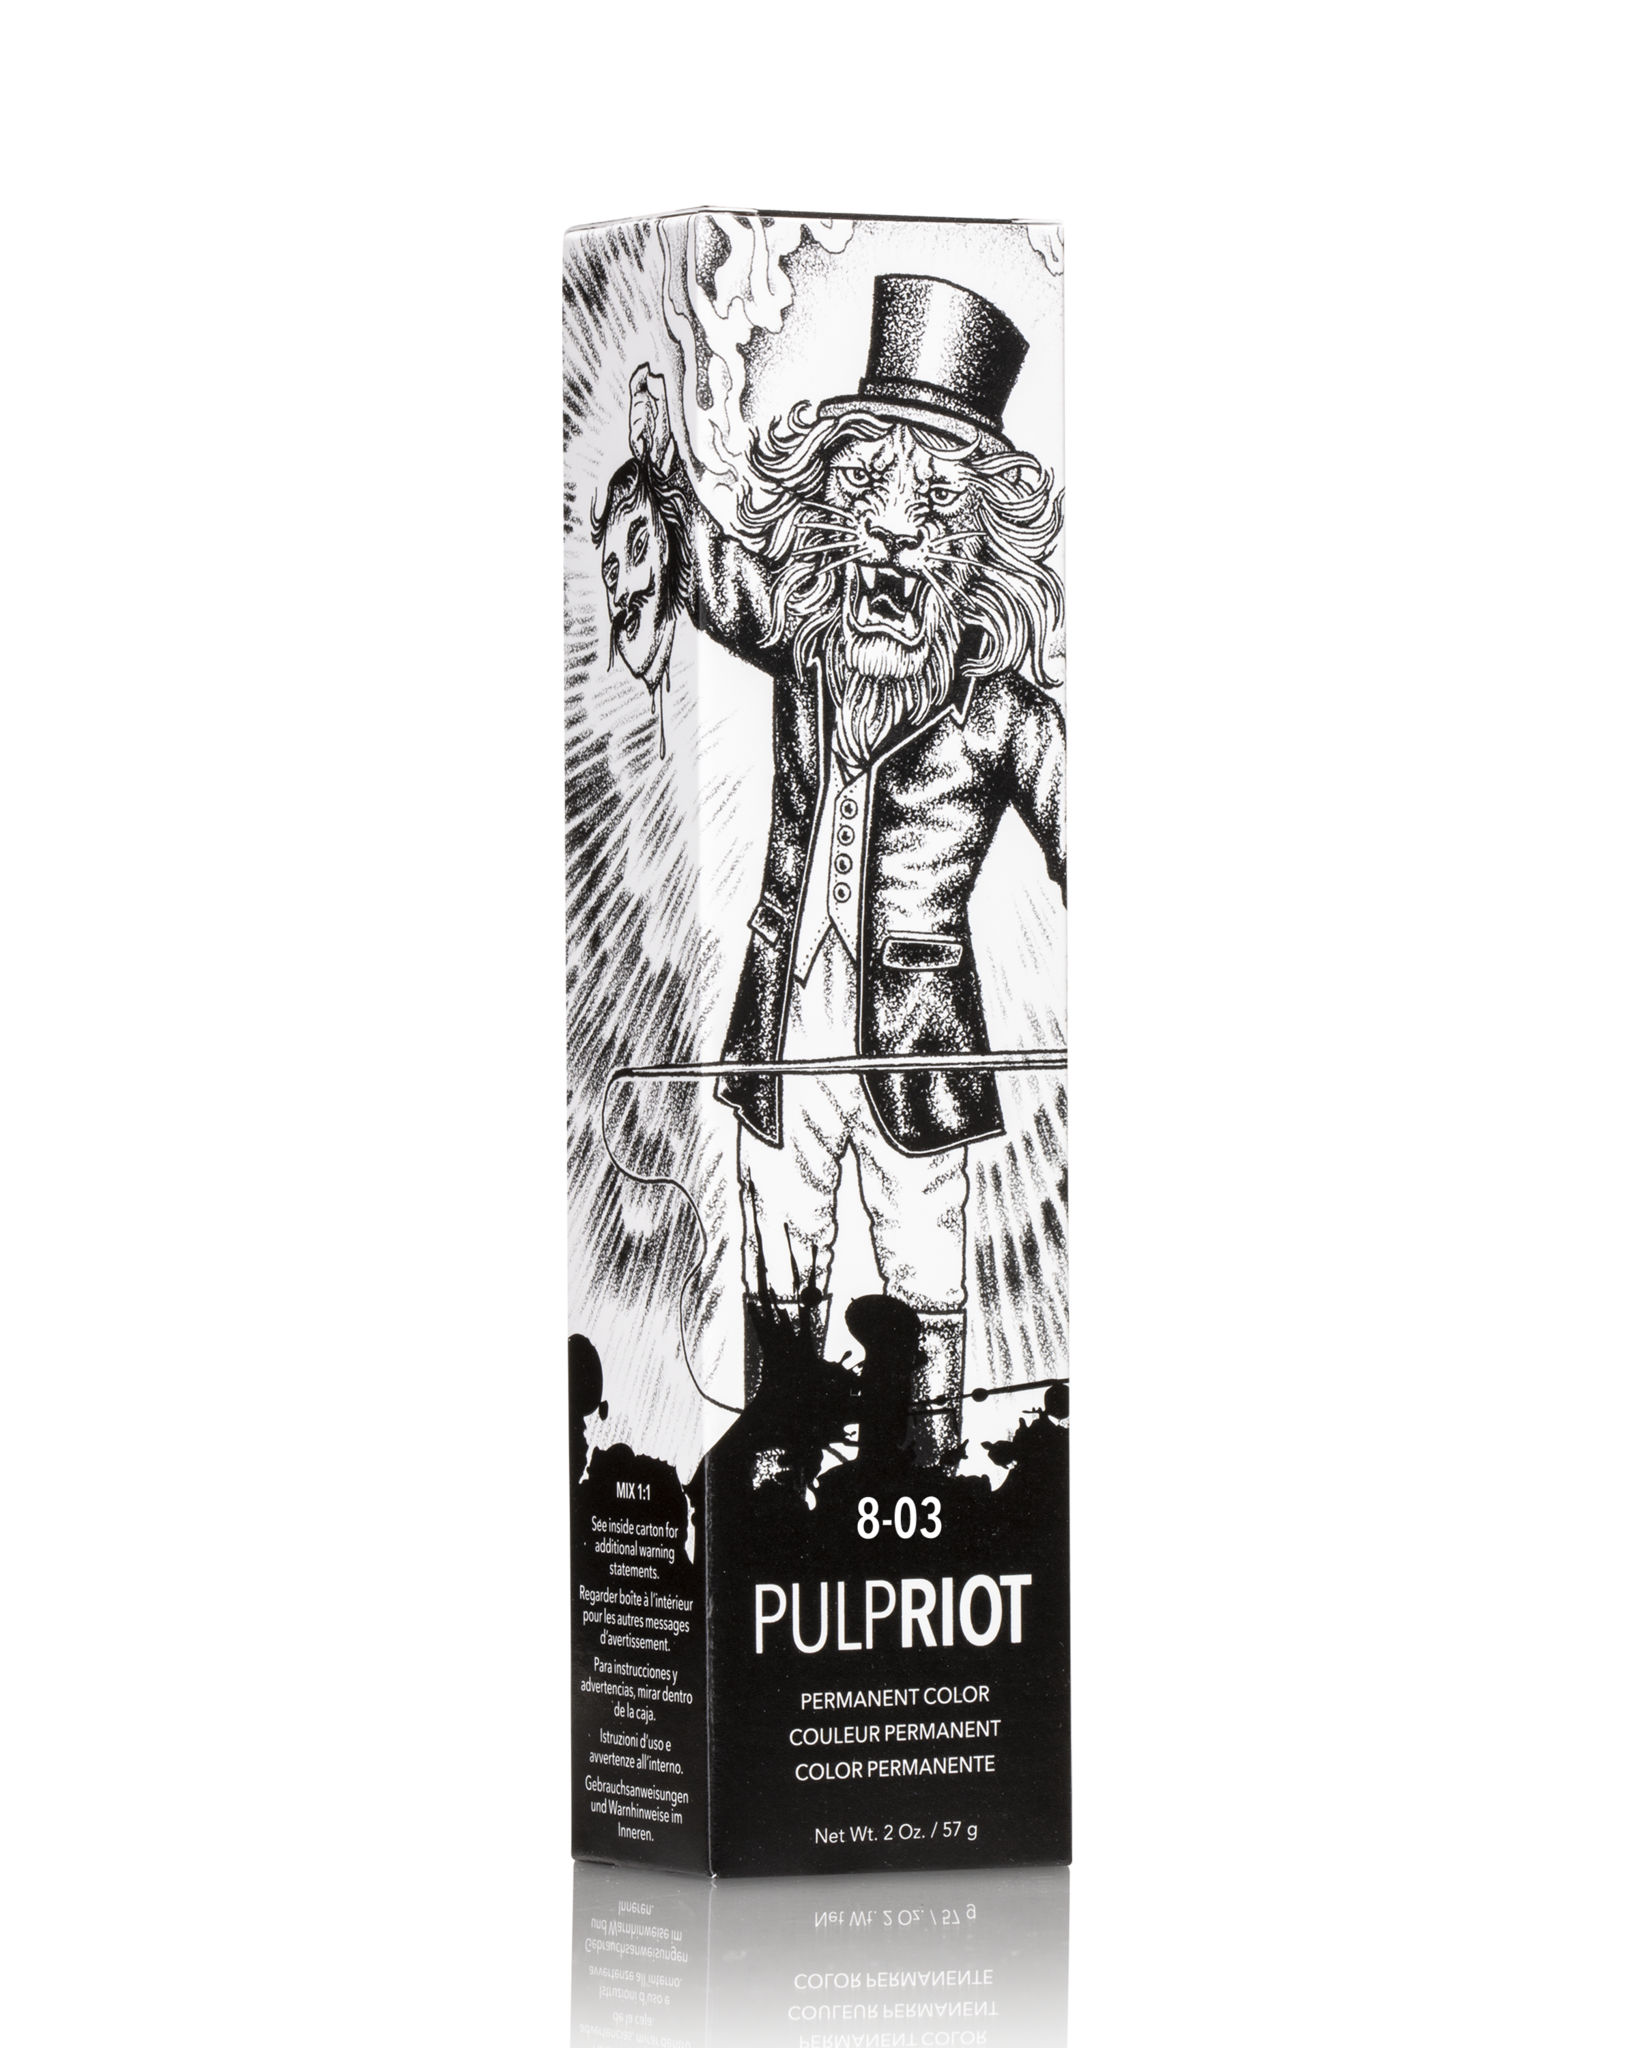 Pulp Riot PULP RIOT FACTION 8 NATUREL DORÉ/NATUREL GOLD 8-03